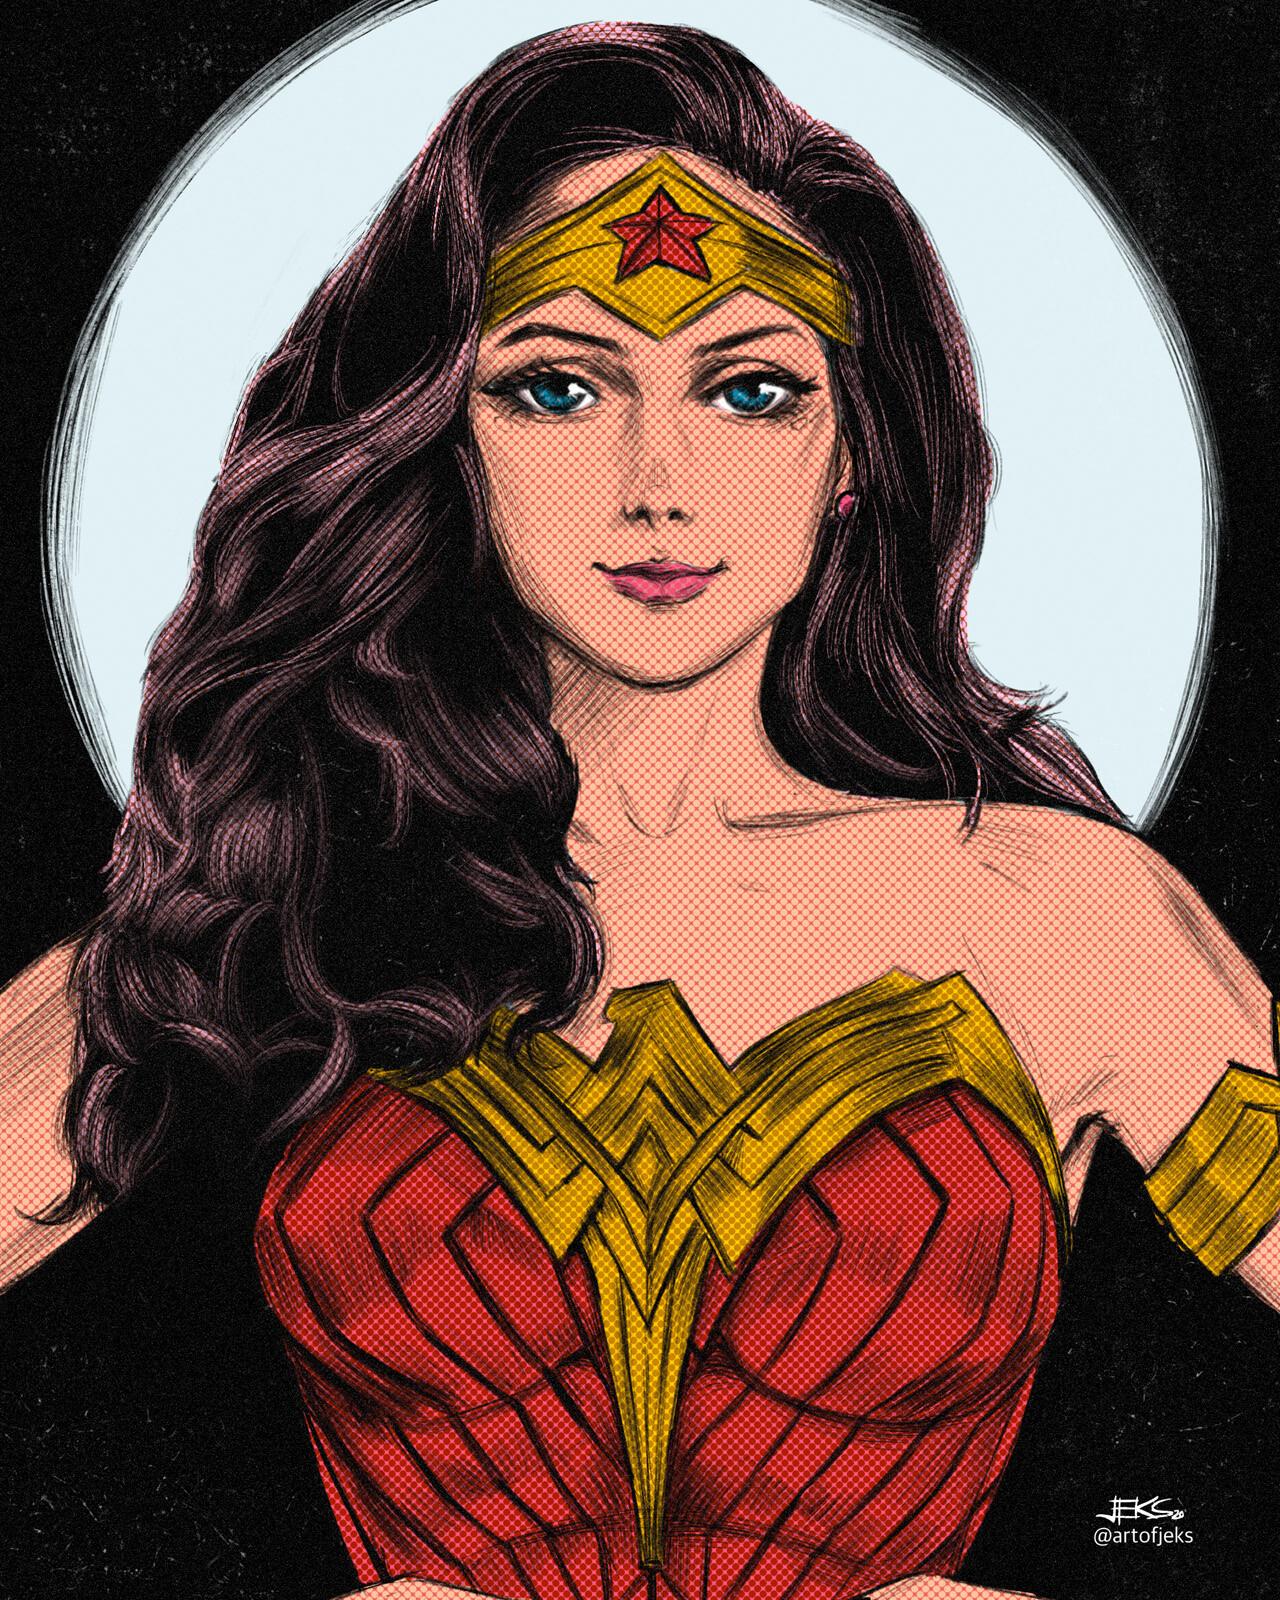 27 - Wonder Woman of DC Comics